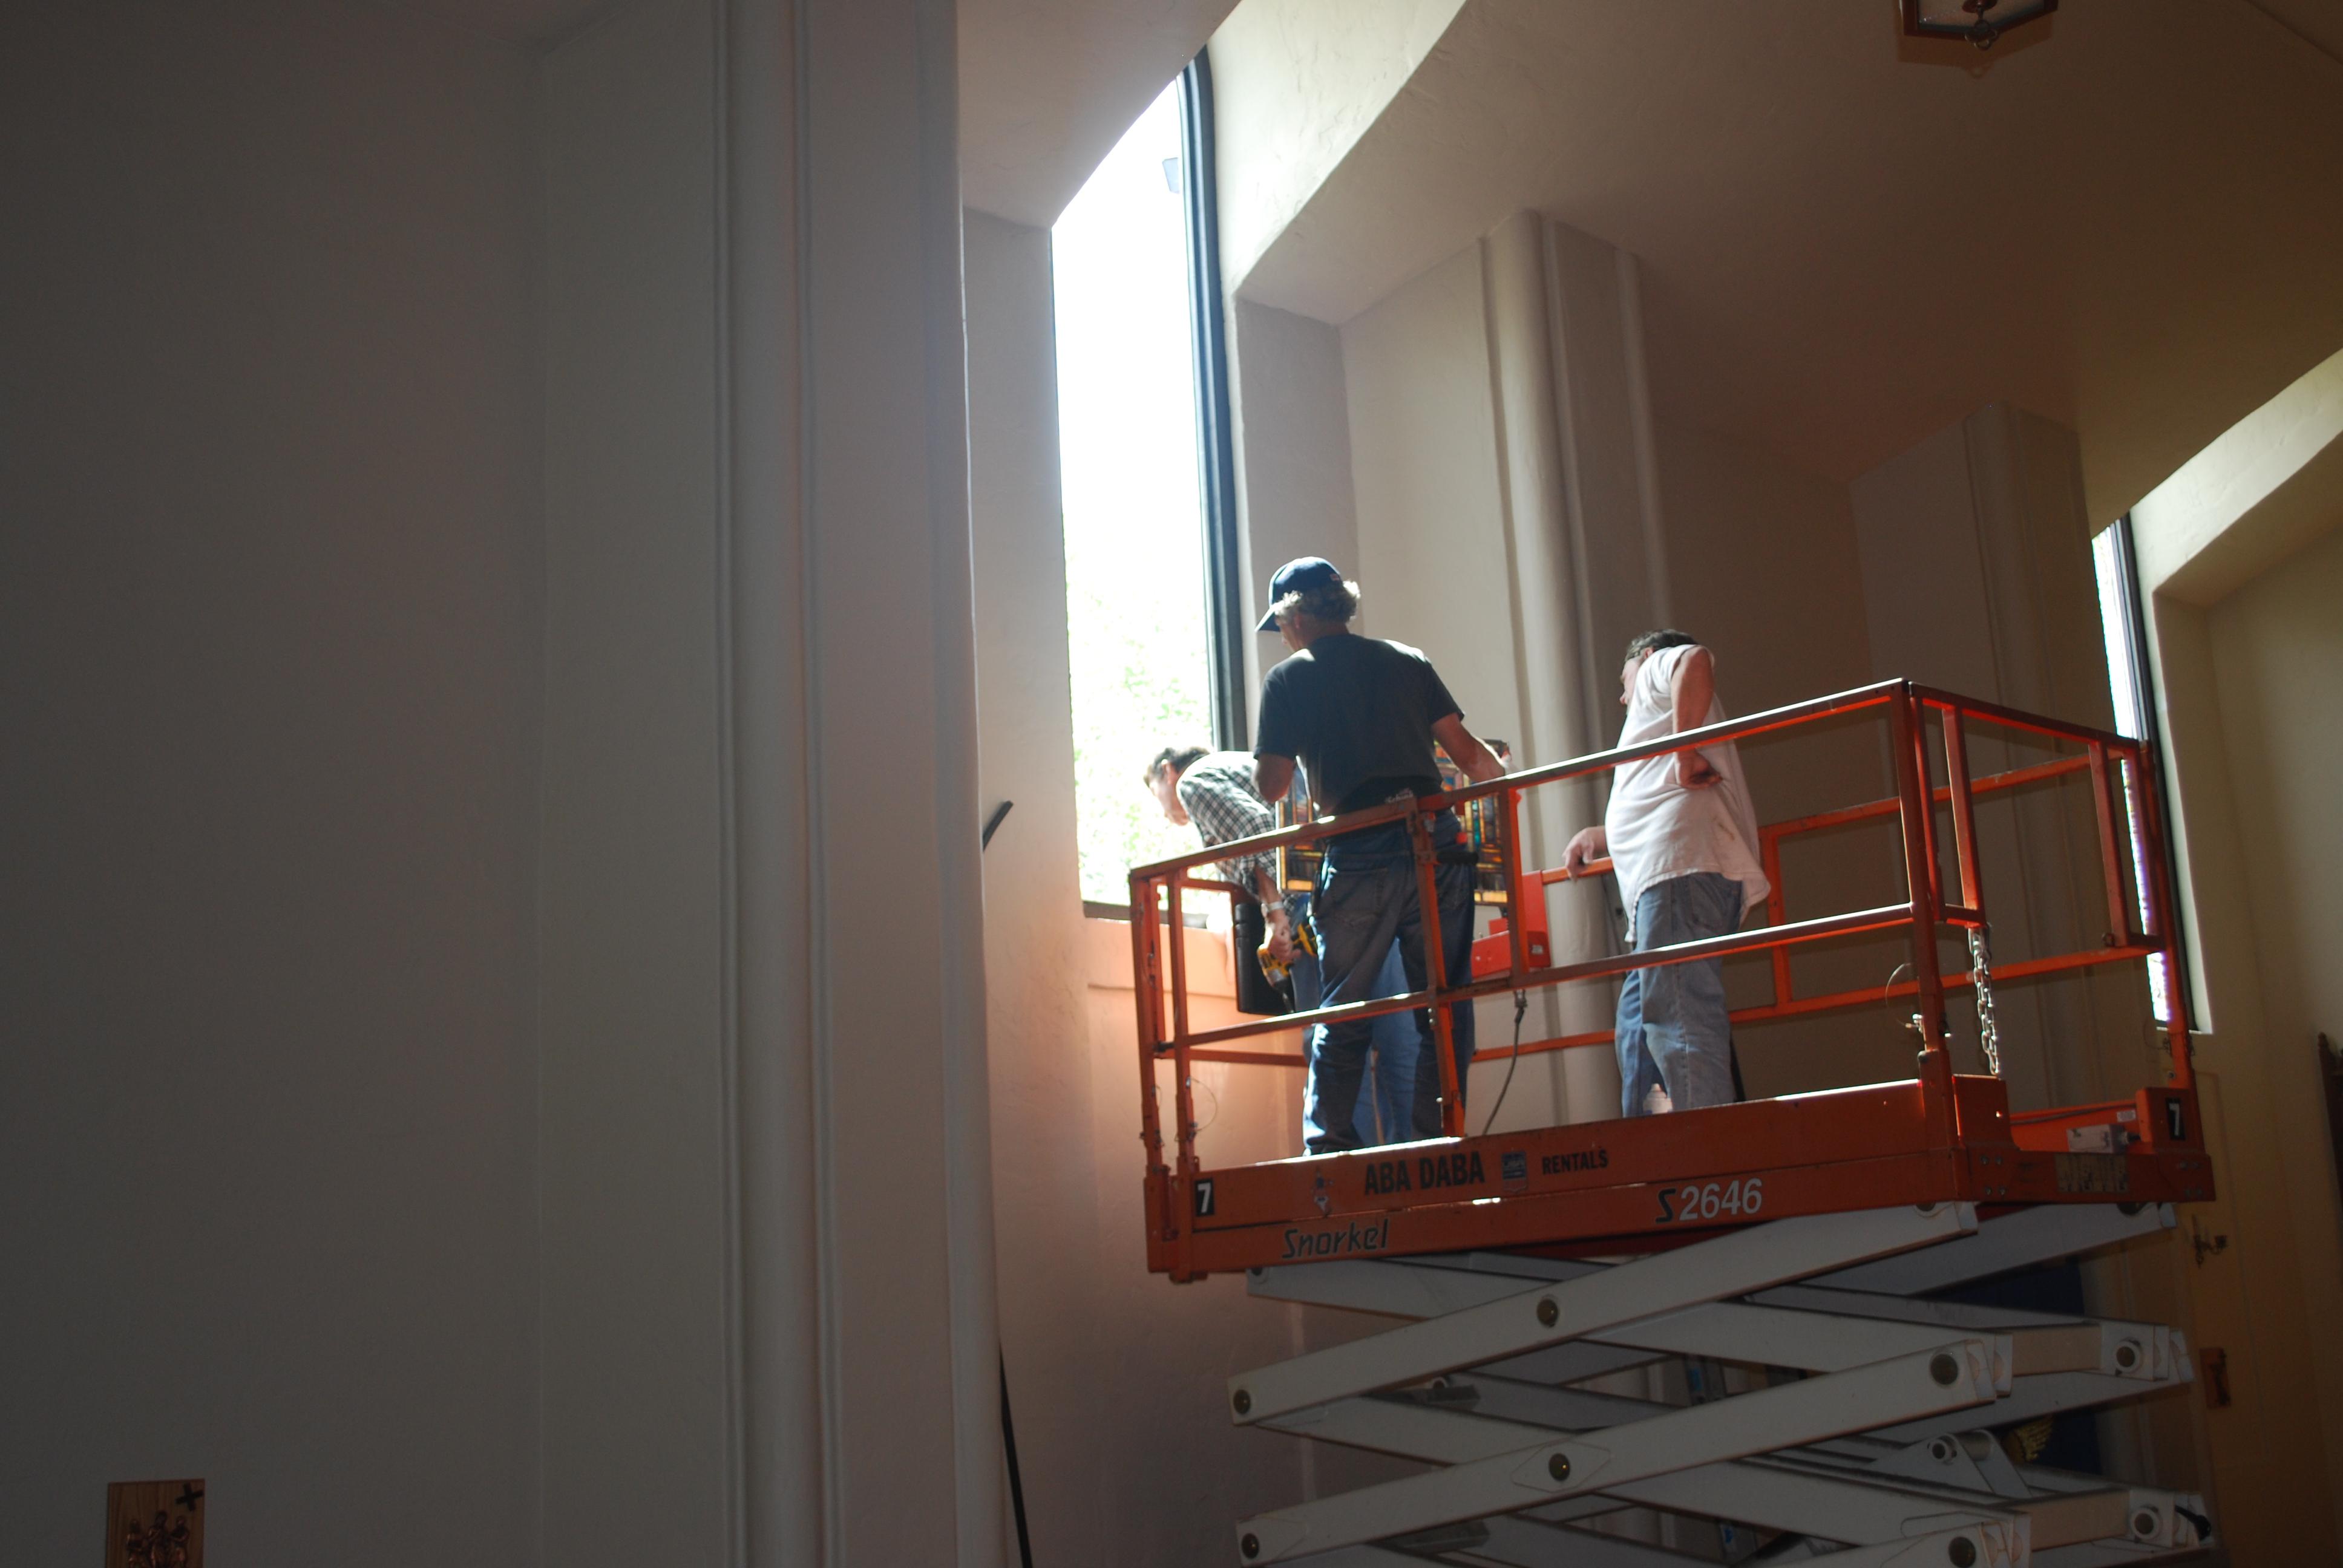 instaling windows